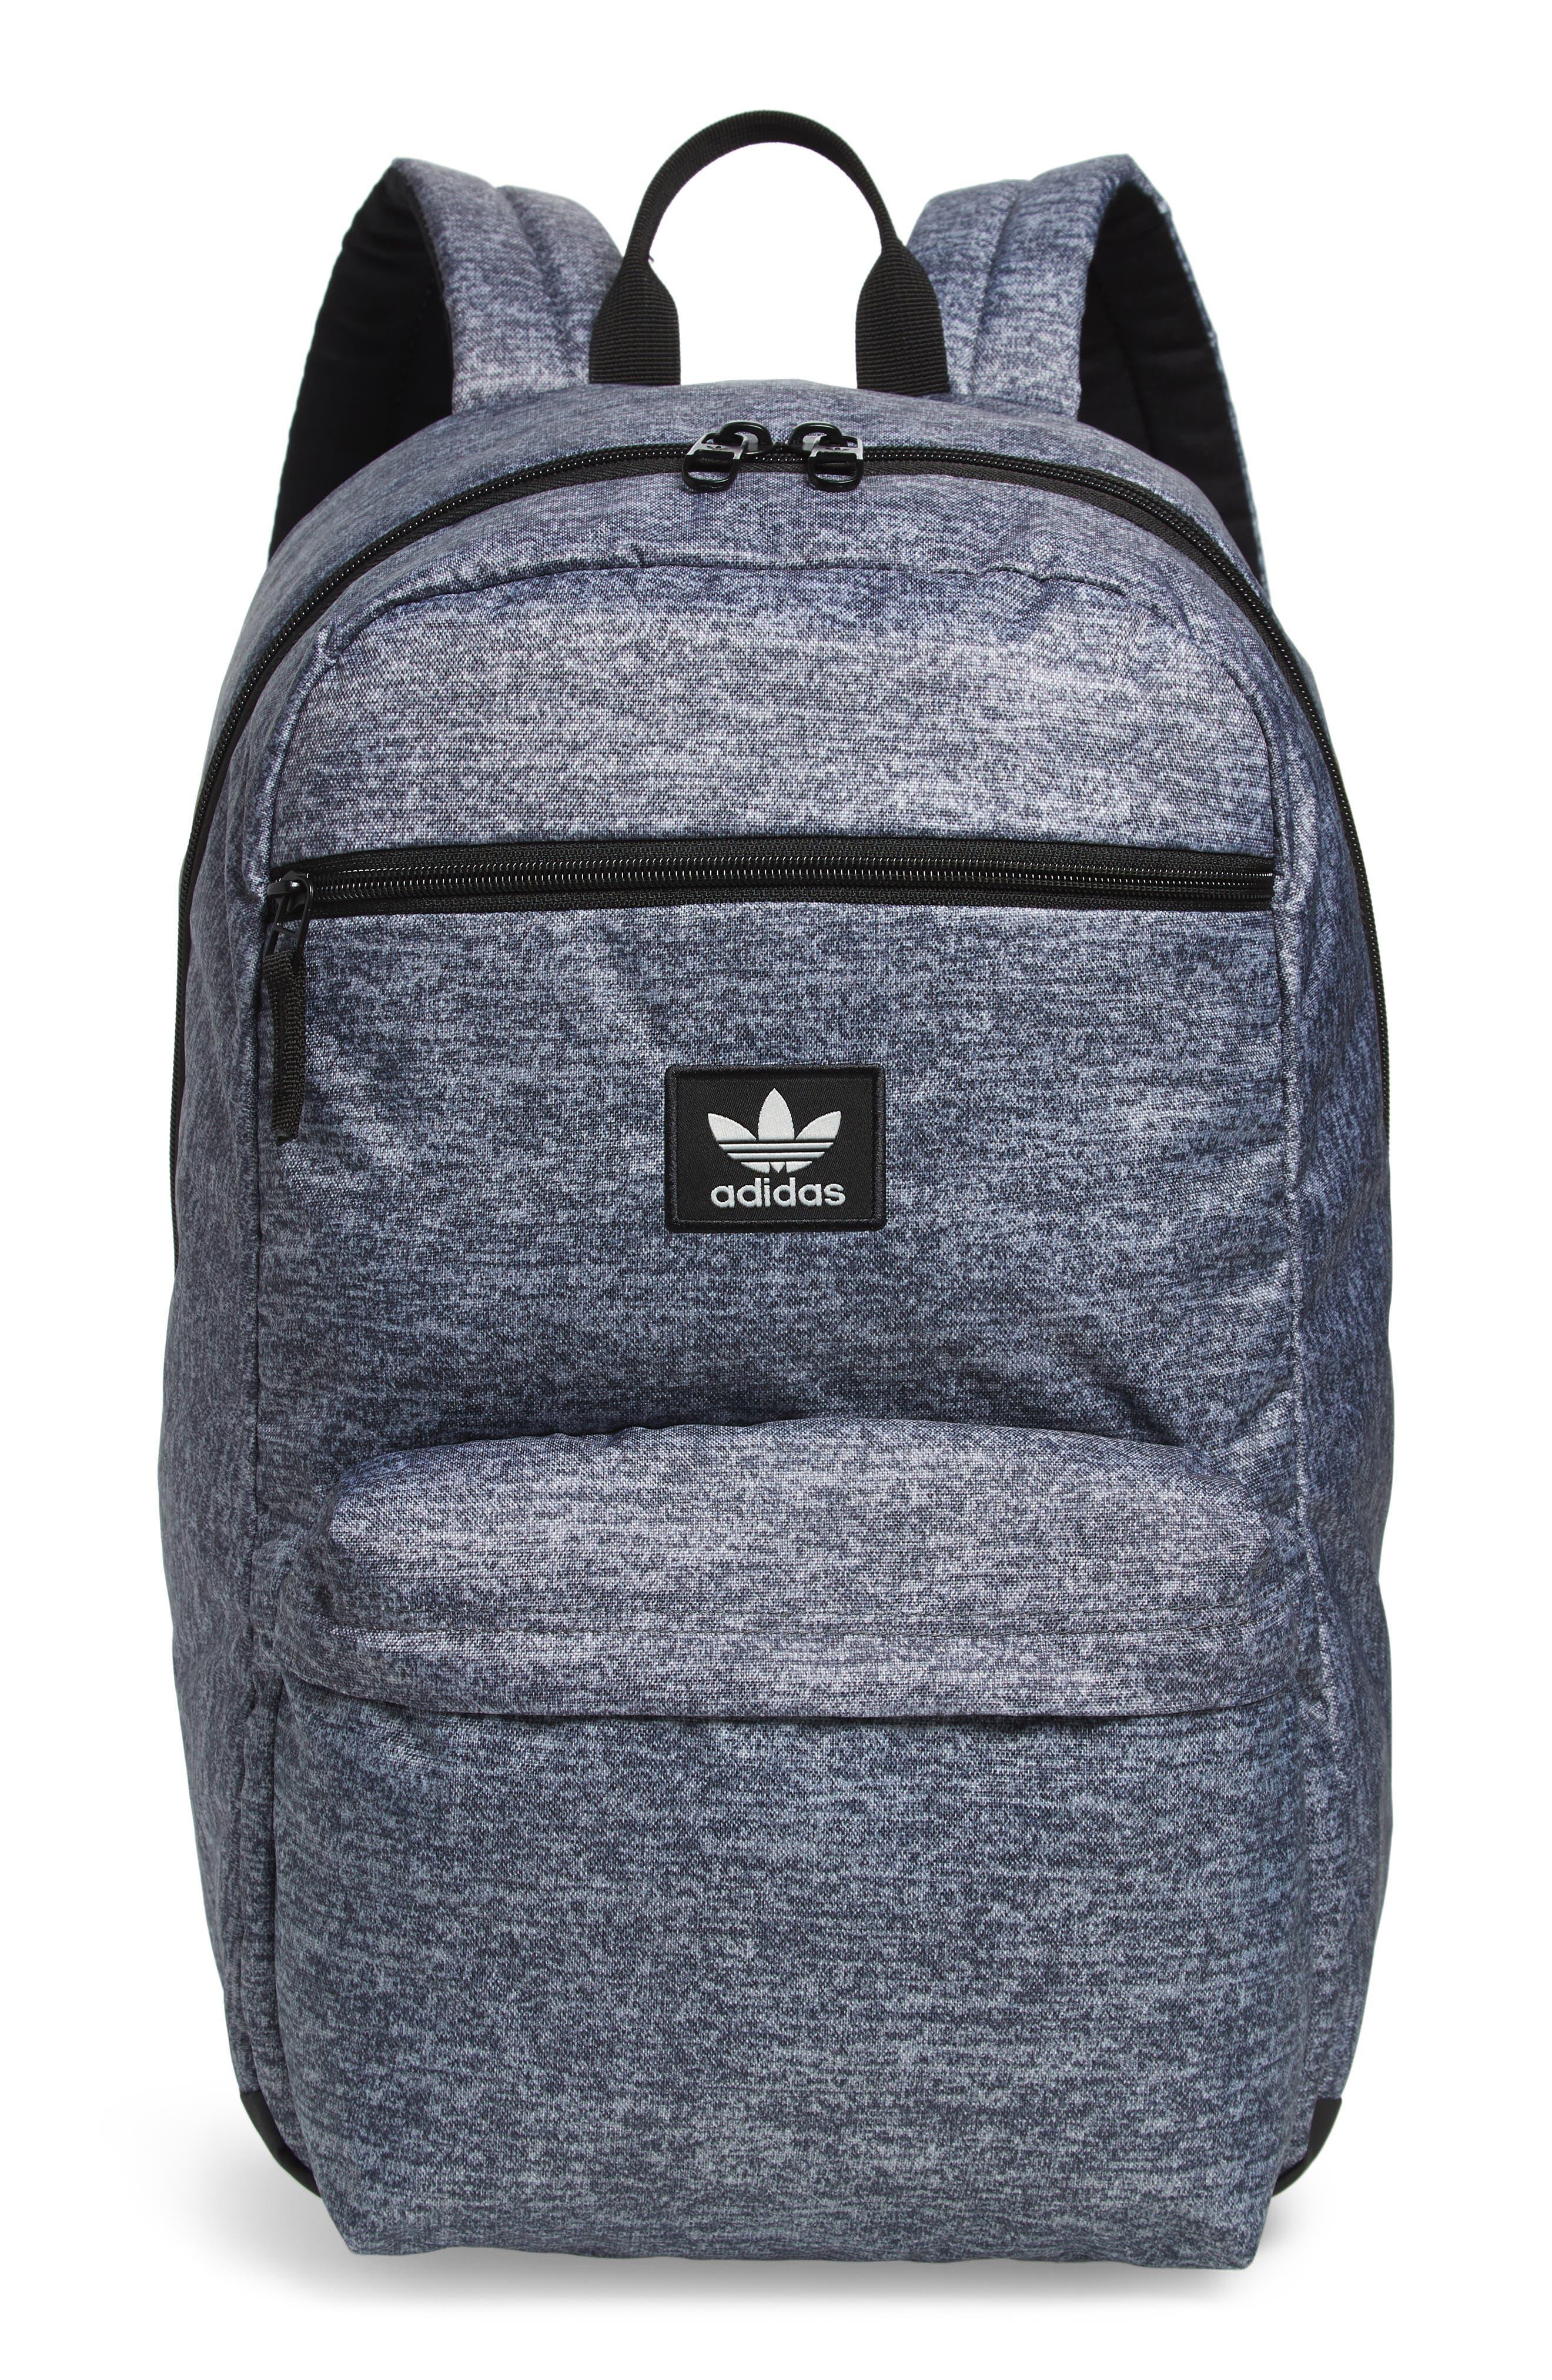 Adidas Original National Backpack - Black